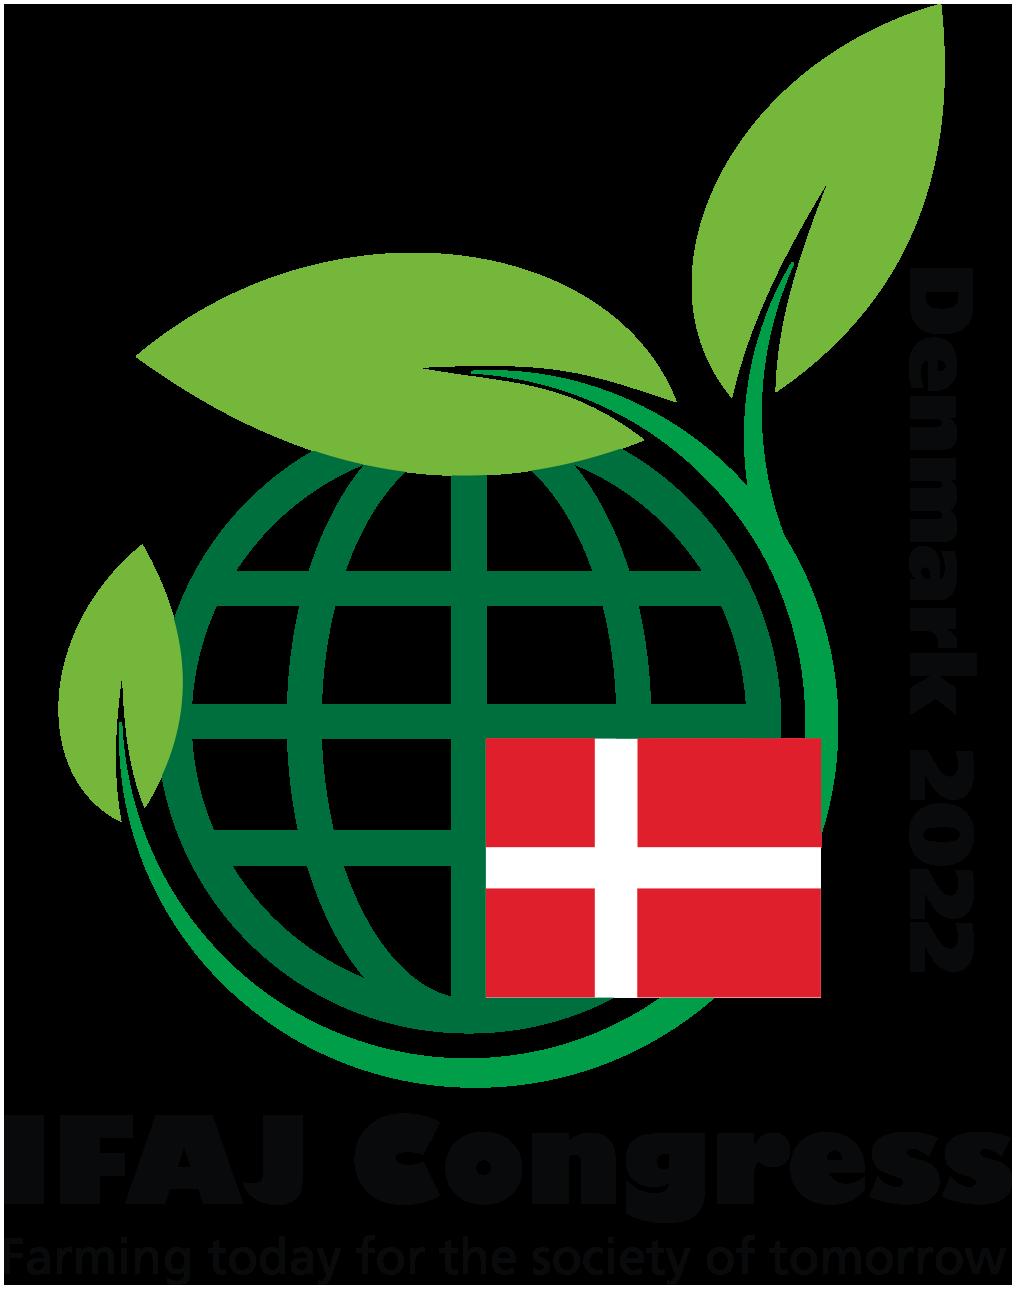 IFAJ 2021-kongressen I Danmark Er Aflyst